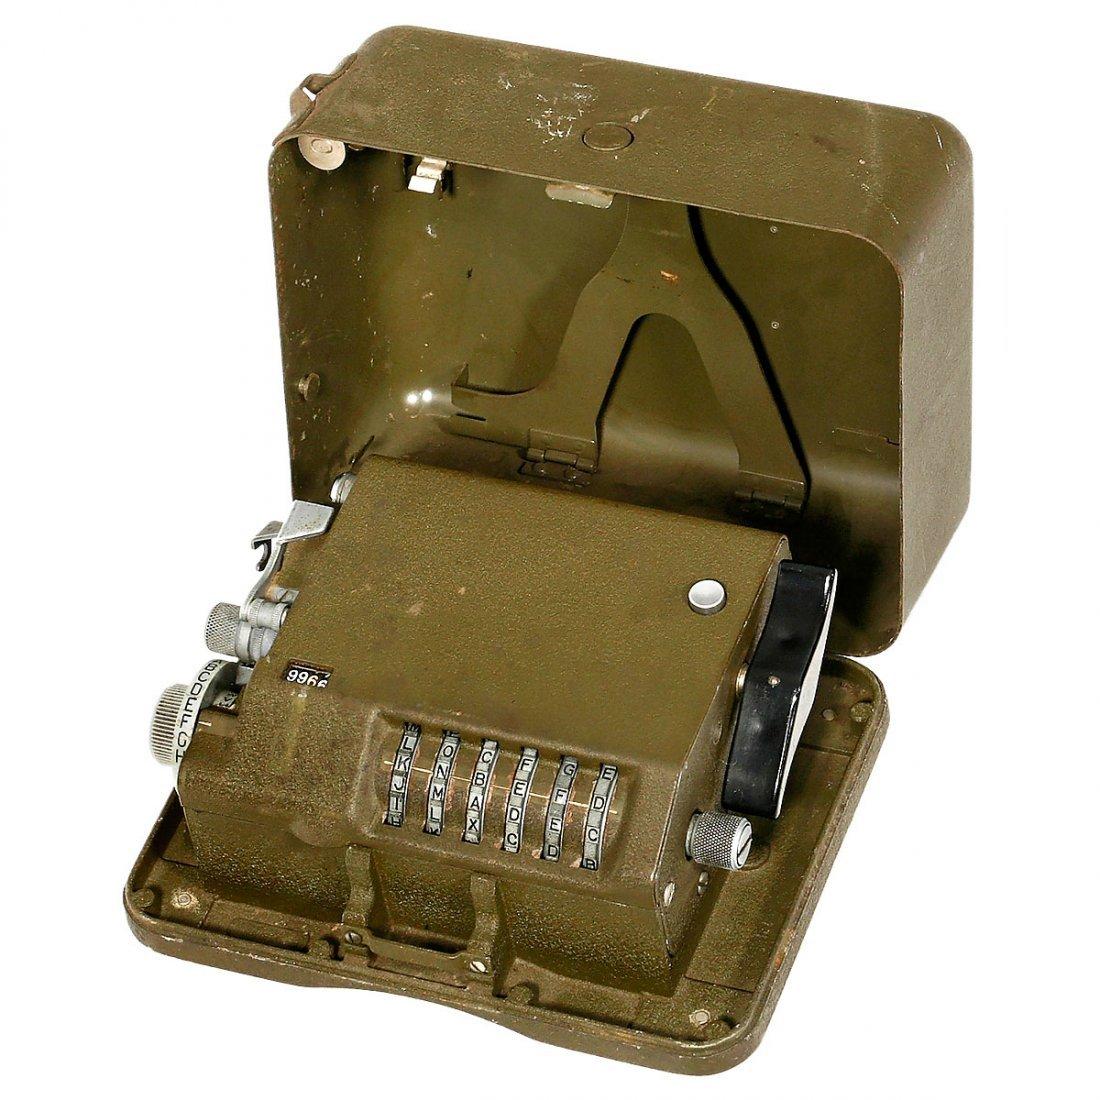 "Rare American 6-Rotor Cryptographic Machine ""M-209-B"","